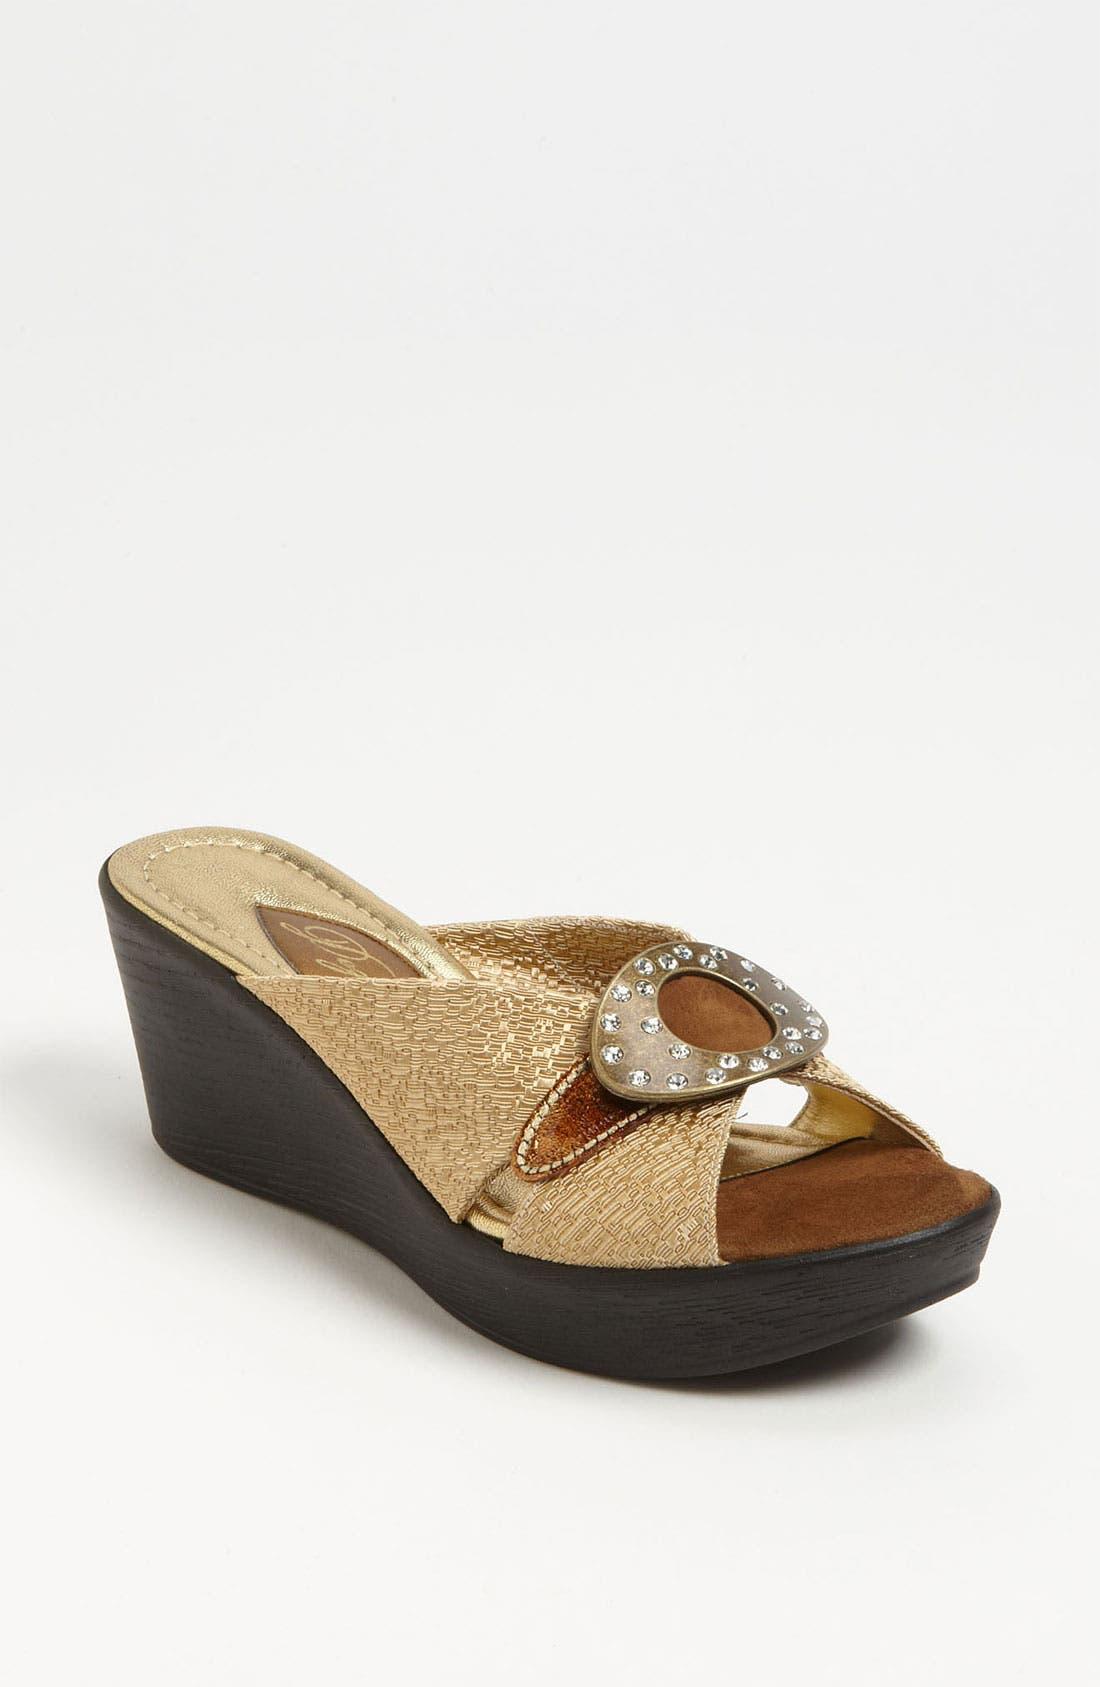 Alternate Image 1 Selected - Dezario 'Pepi' Sandal